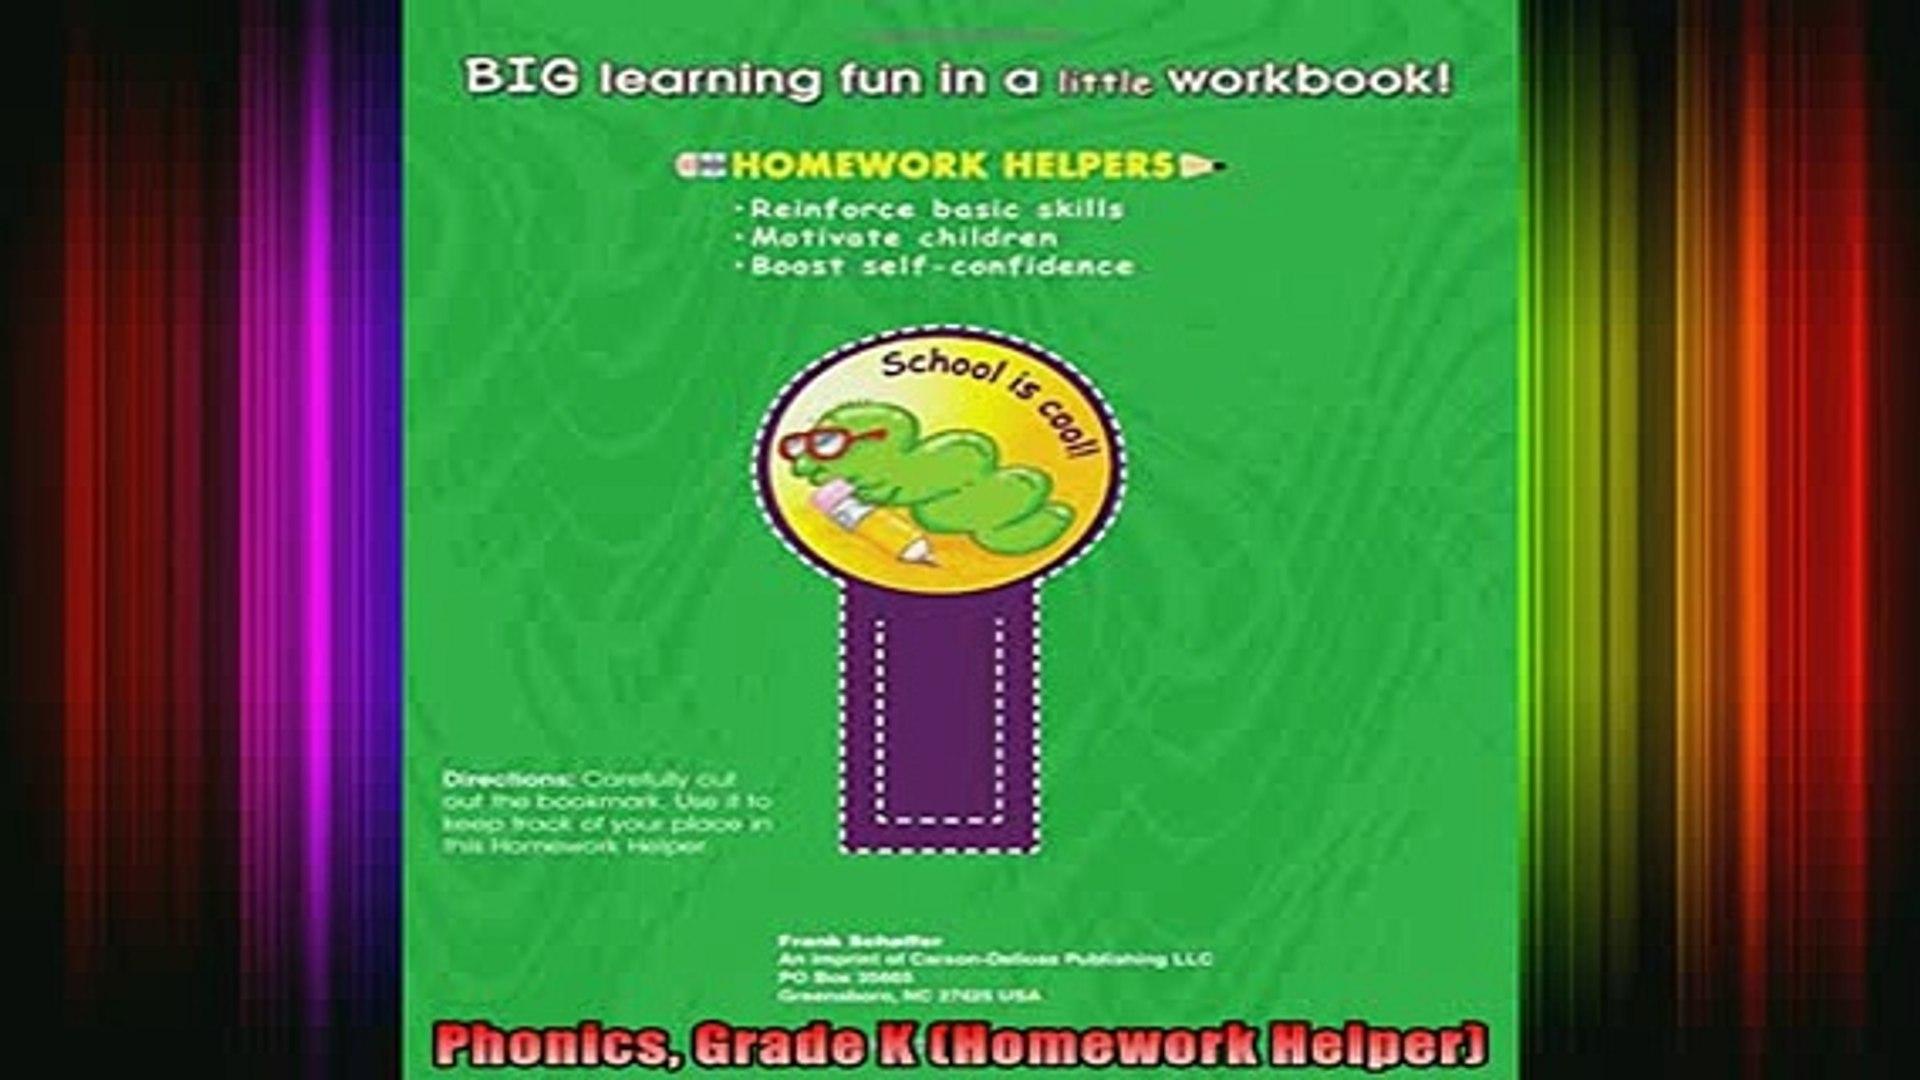 Free Full PDF Downlaod  Phonics Grade K Homework Helper Full EBook